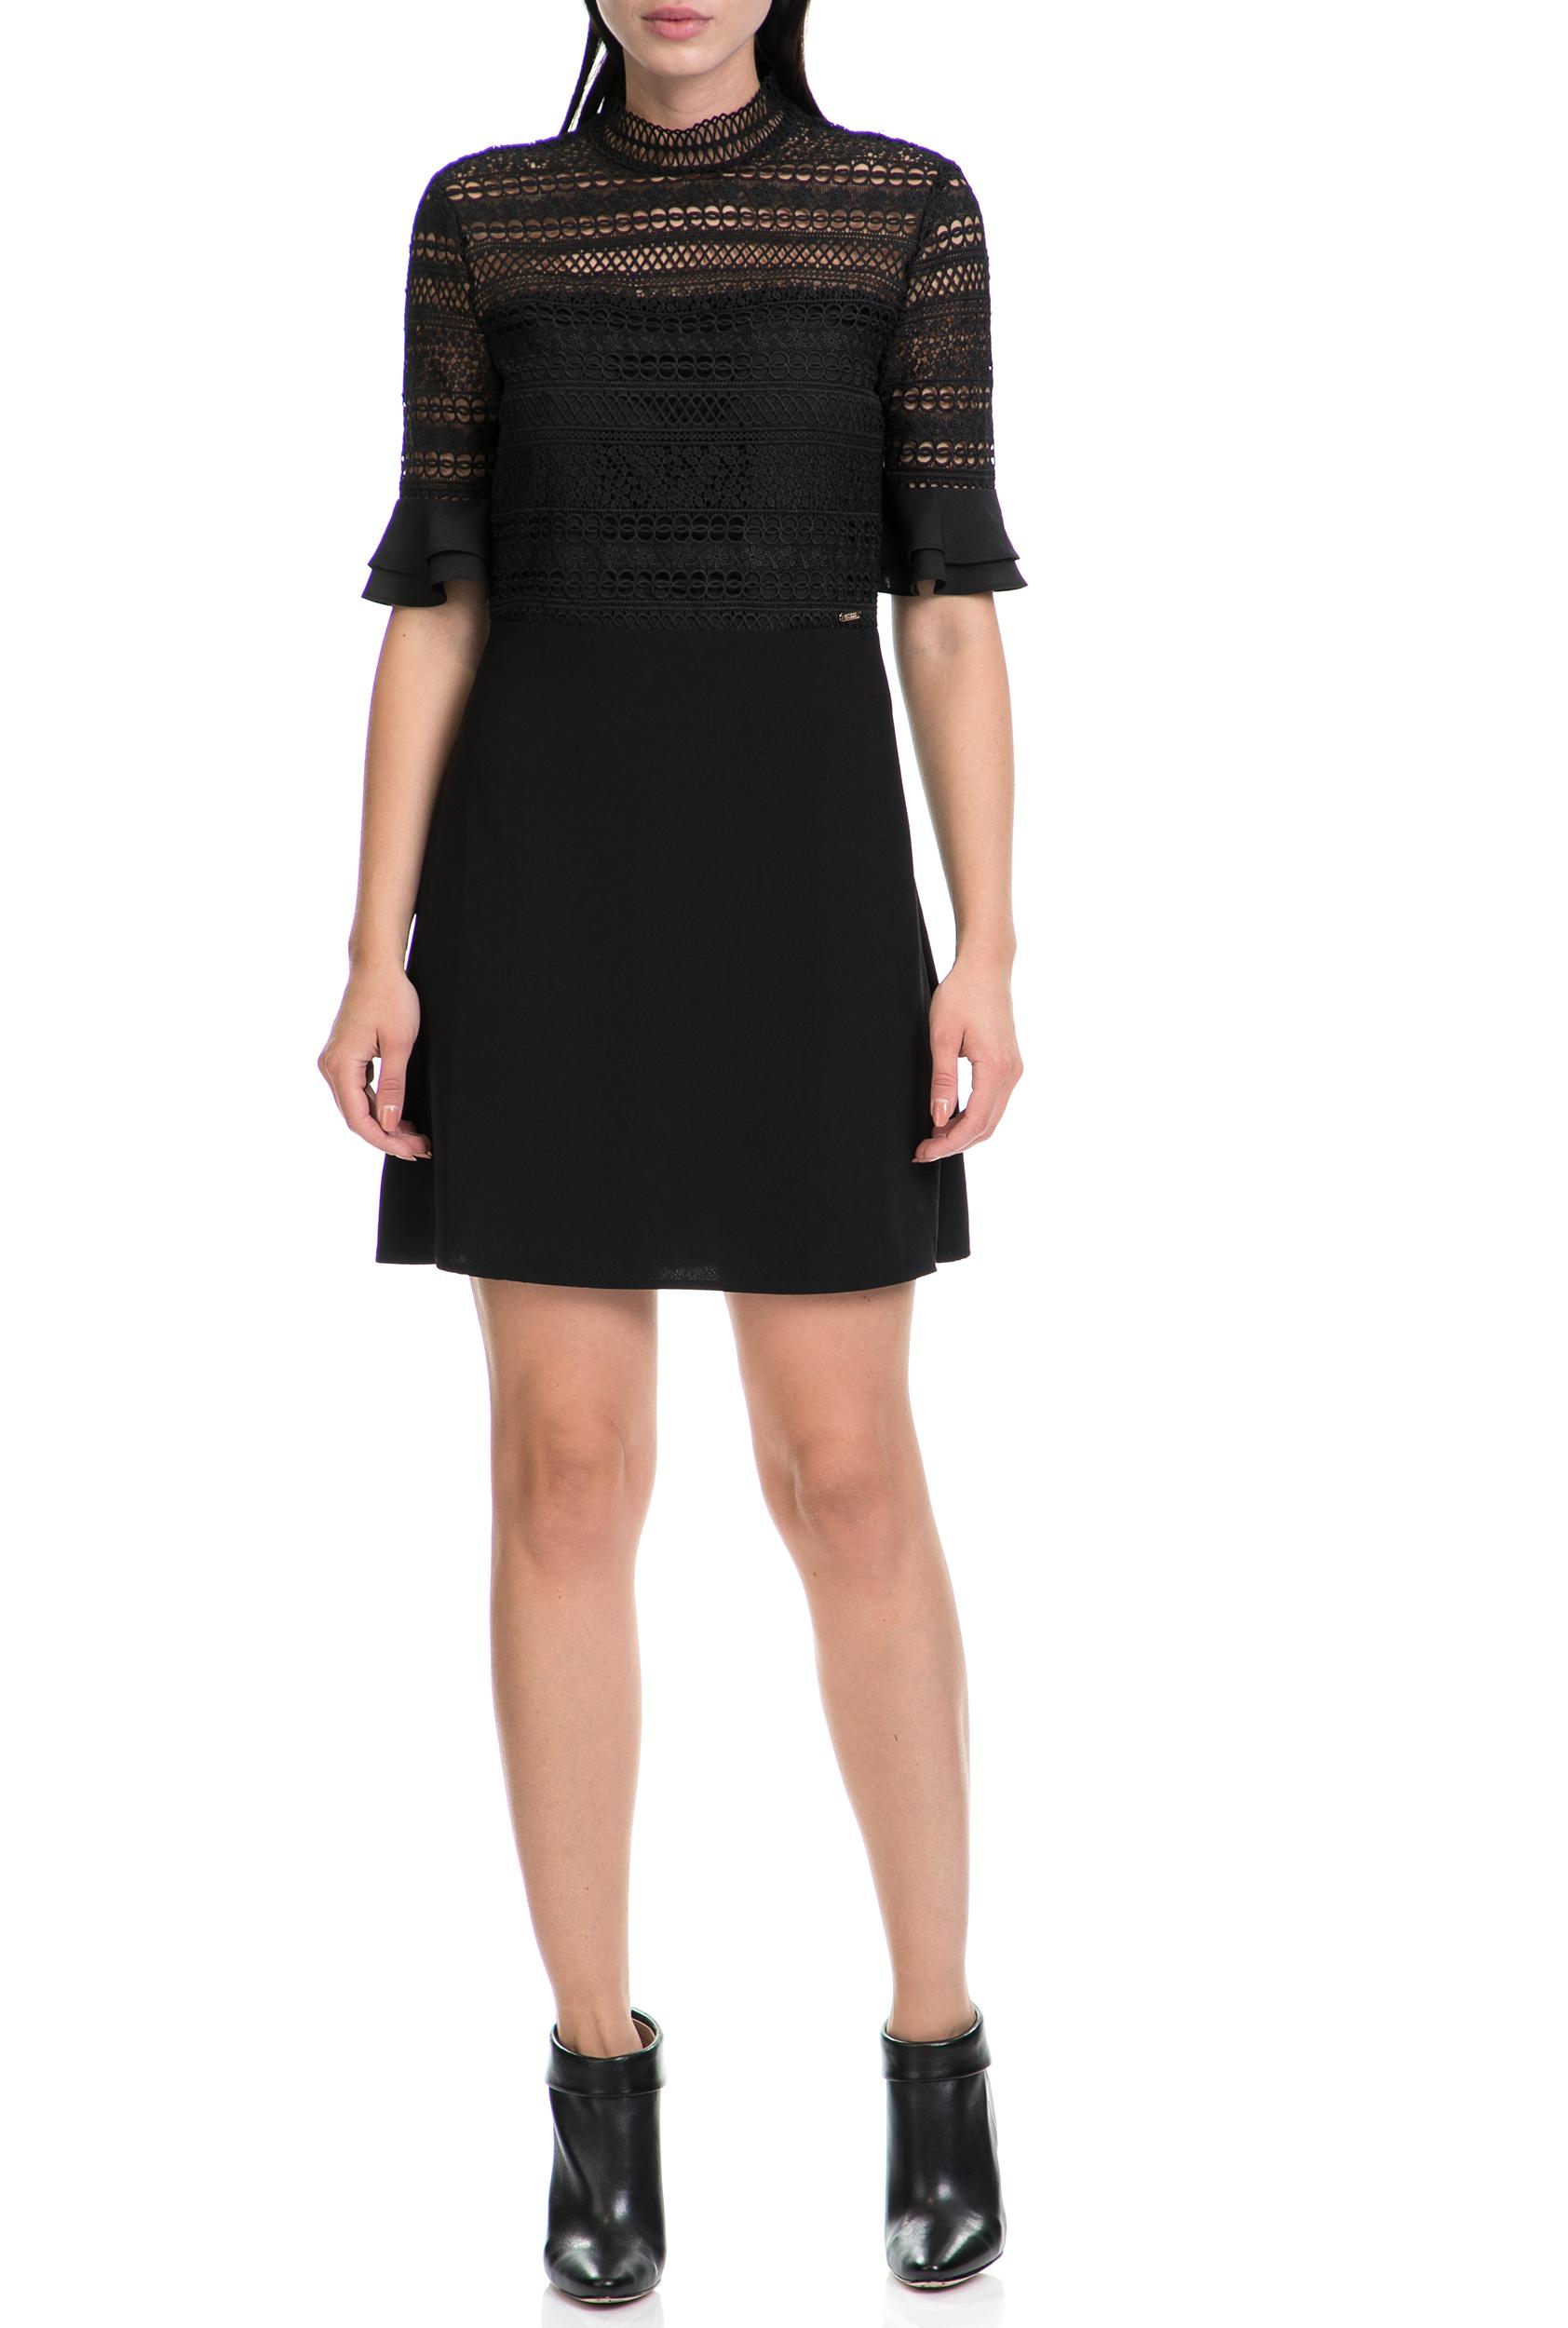 c1b7c744d75e GUESS - Γυναικείο φόρεμα EDITH GUESS μαύρο